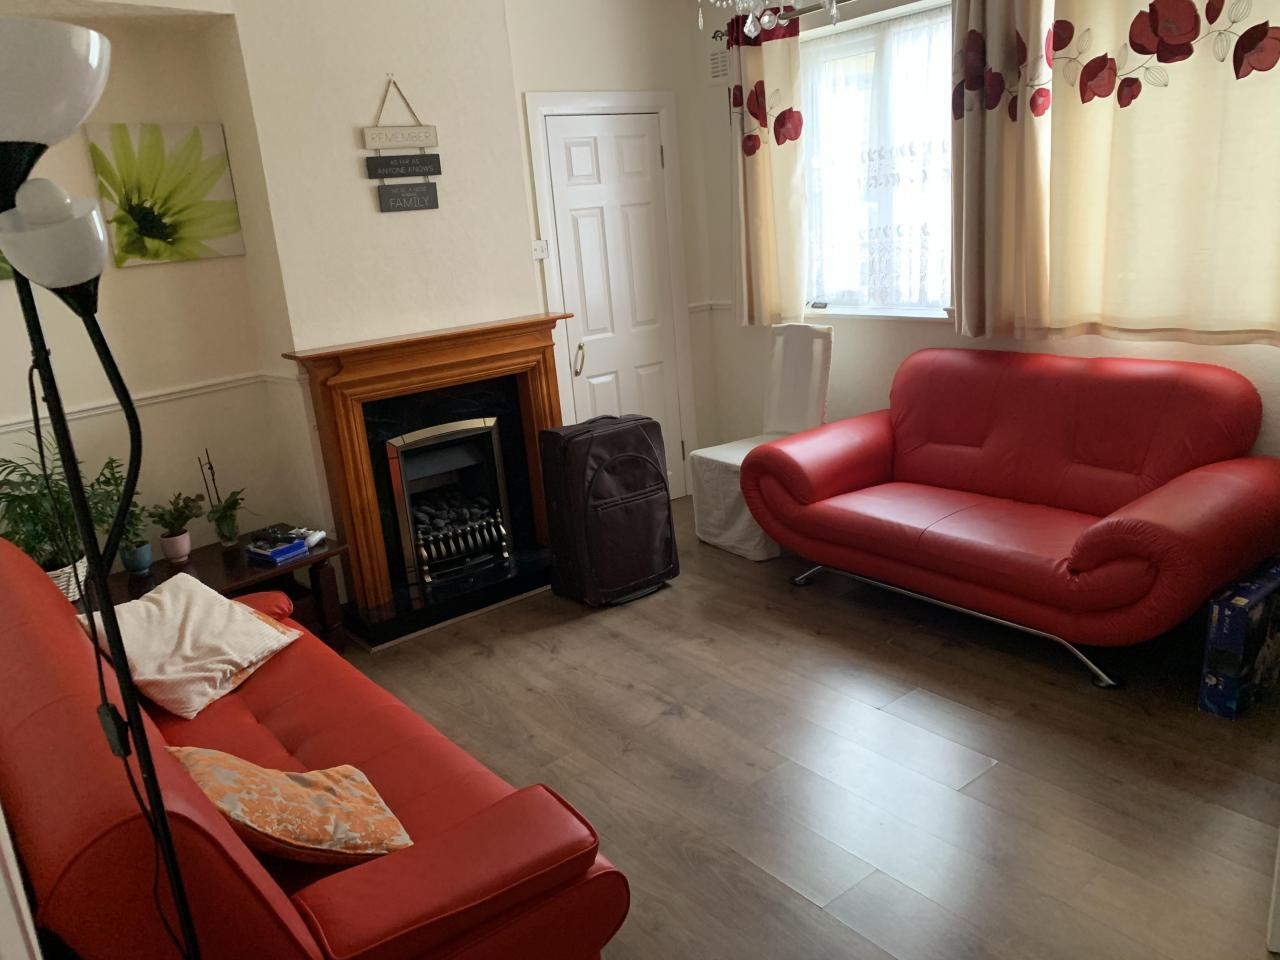 Double room in Haringey (zone 3) - 3